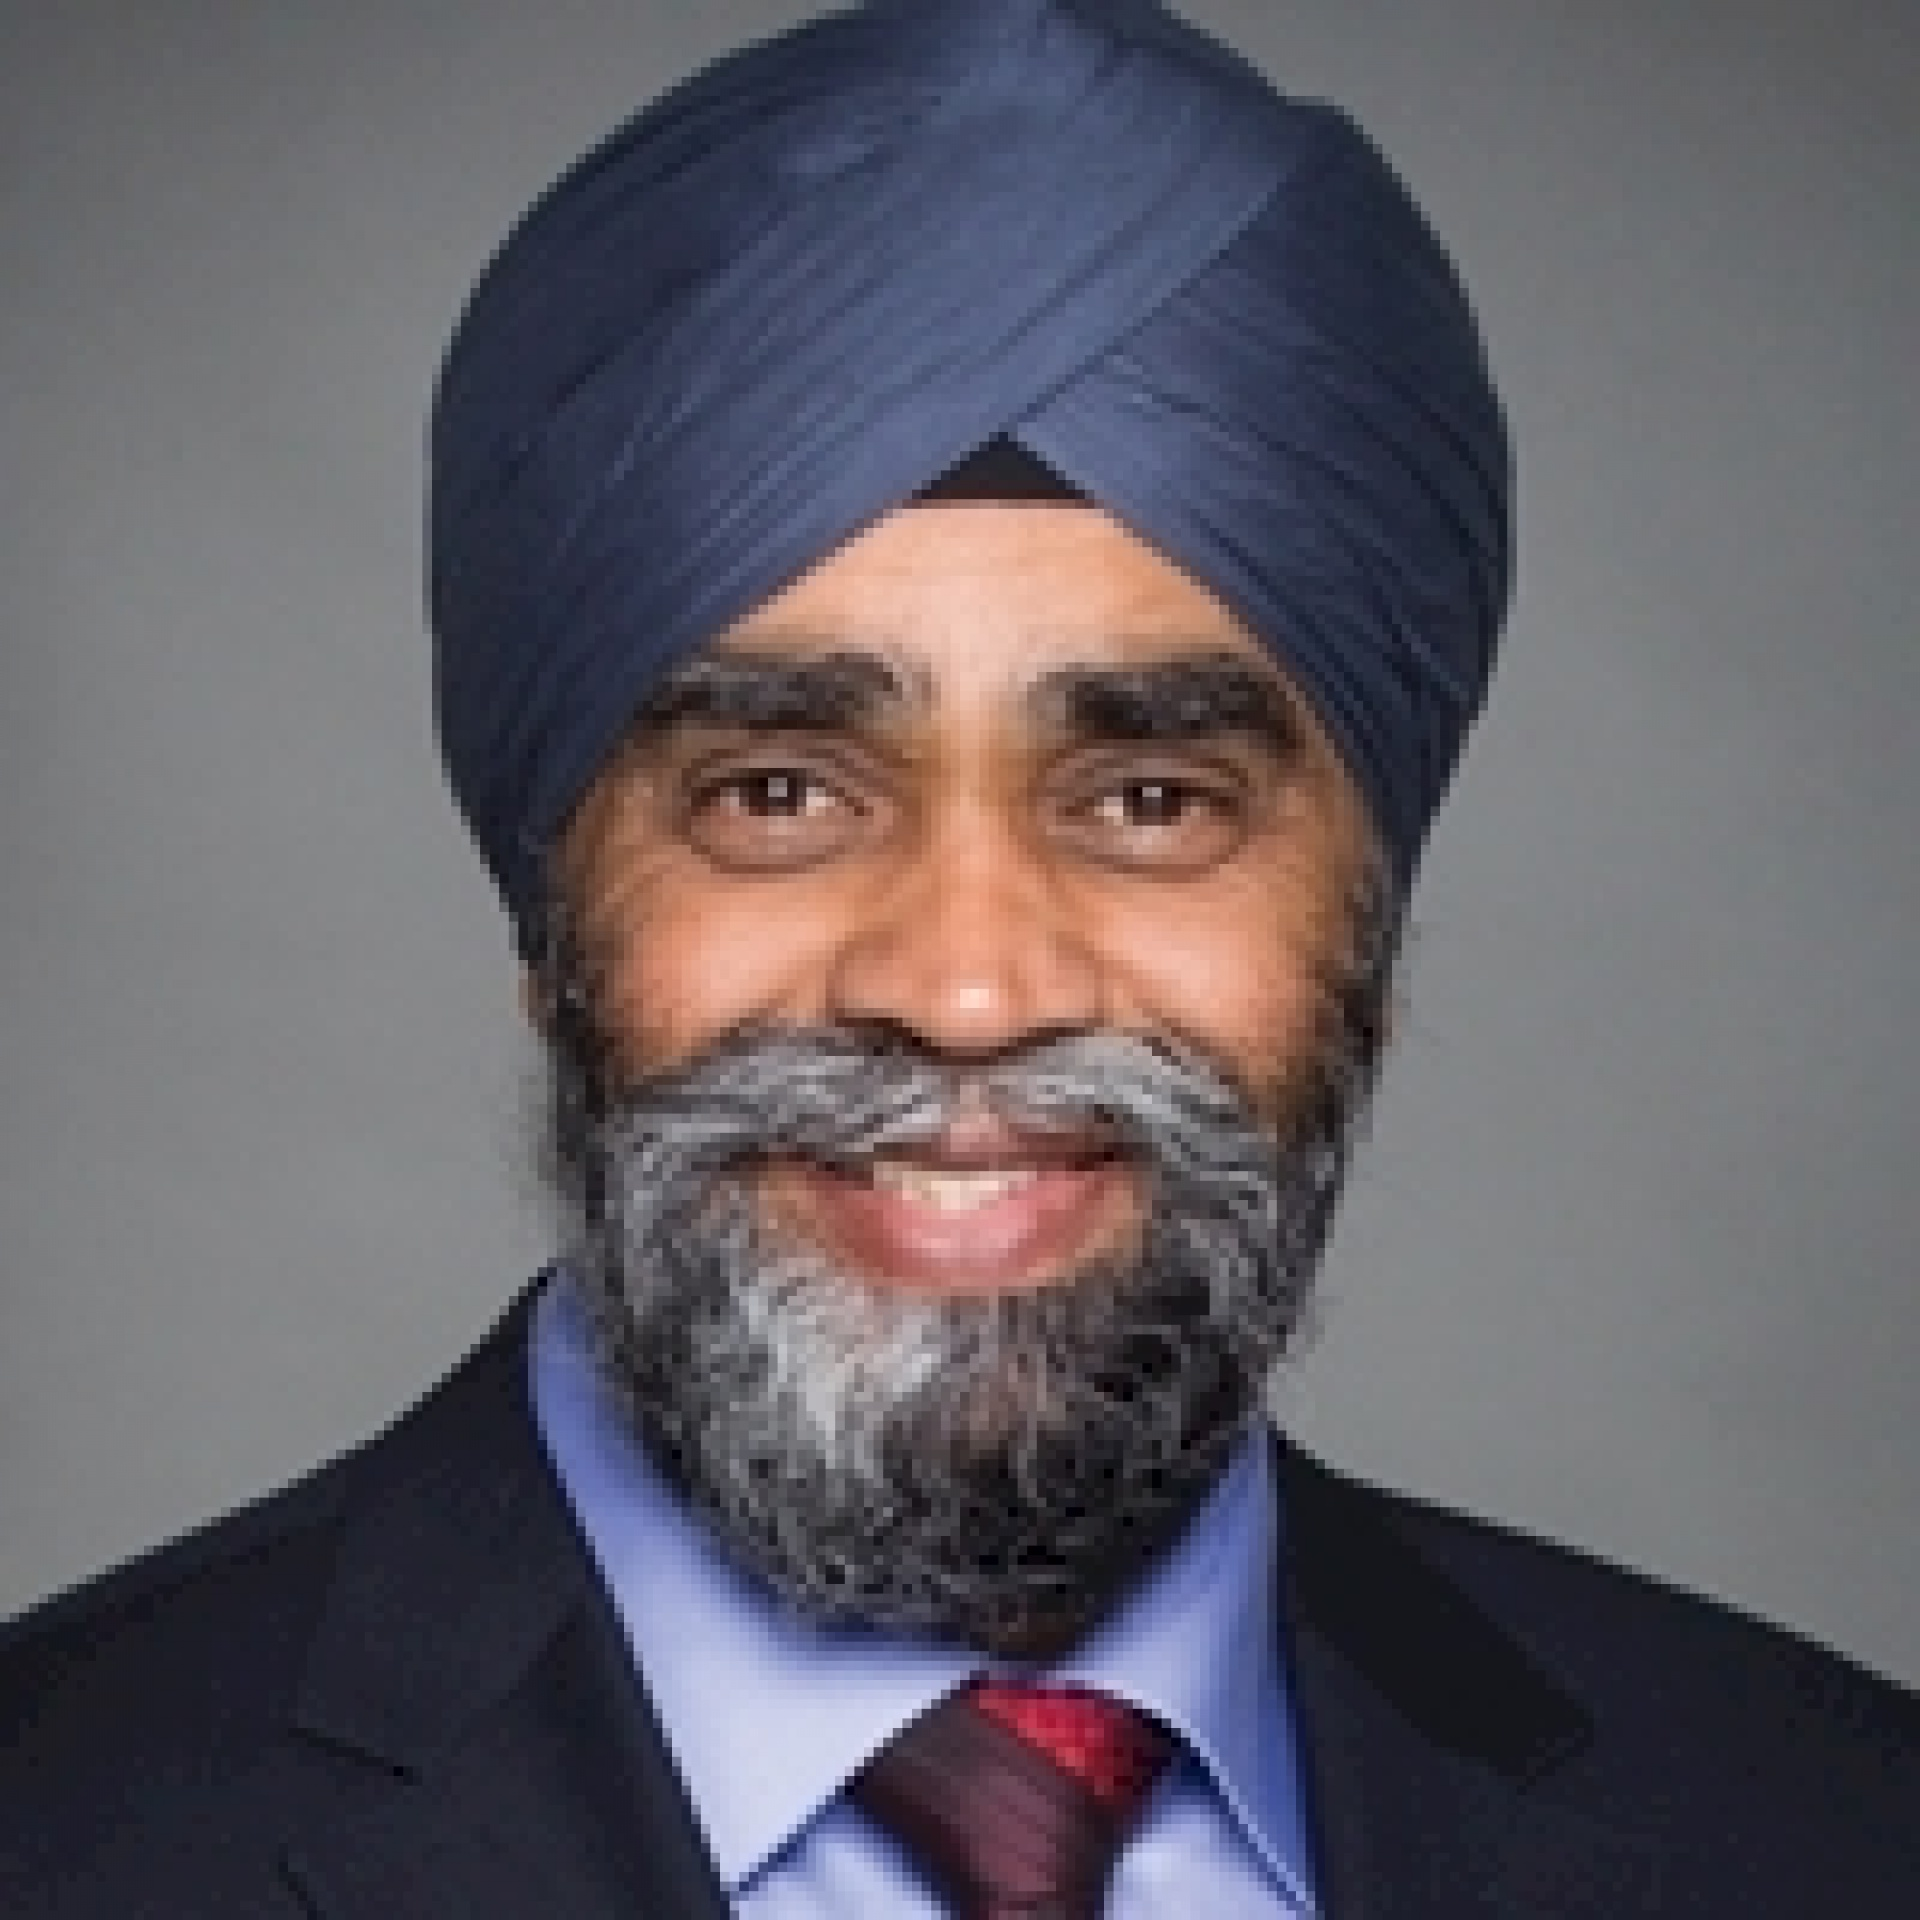 Harjit Singh Sajjan